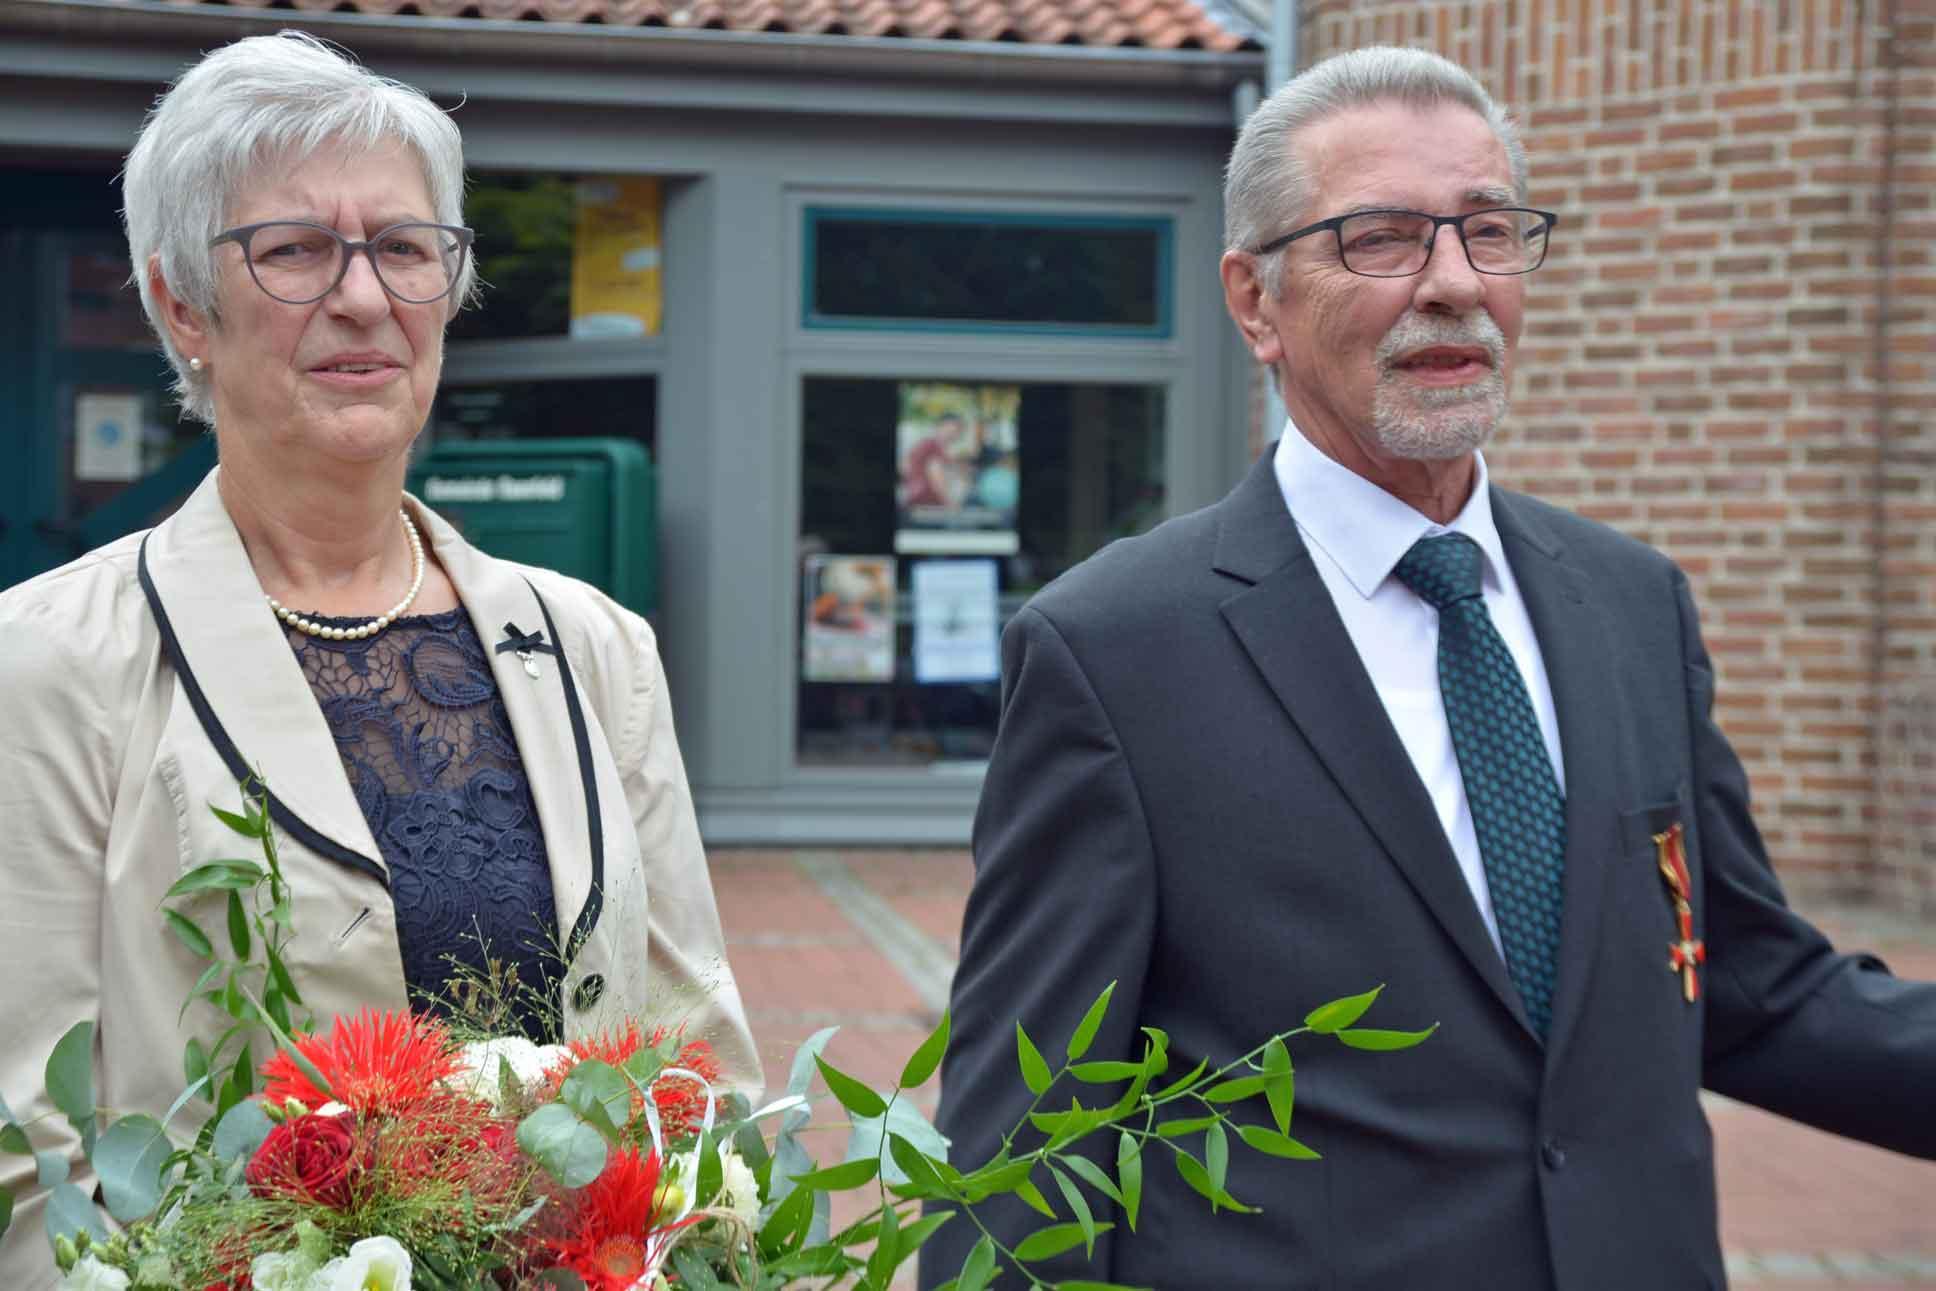 Verdienstkreuz-am-Bande-Martin Hadder-Raesfeld-Laumann